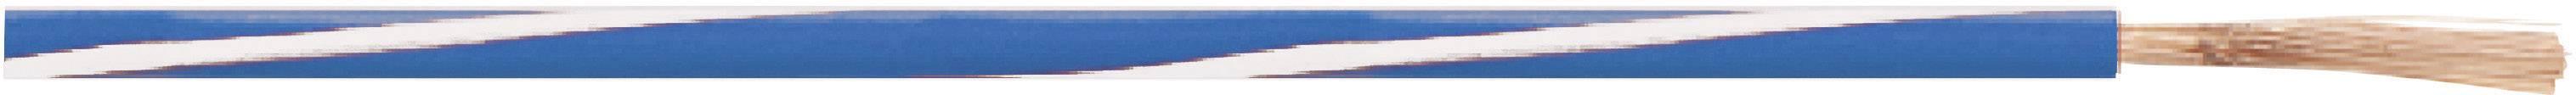 Opletenie / lanko LappKabel 4512441S X05V-K, 1 x 0.50 mm², vonkajší Ø 2.10 mm, metrový tovar, biela, modrá